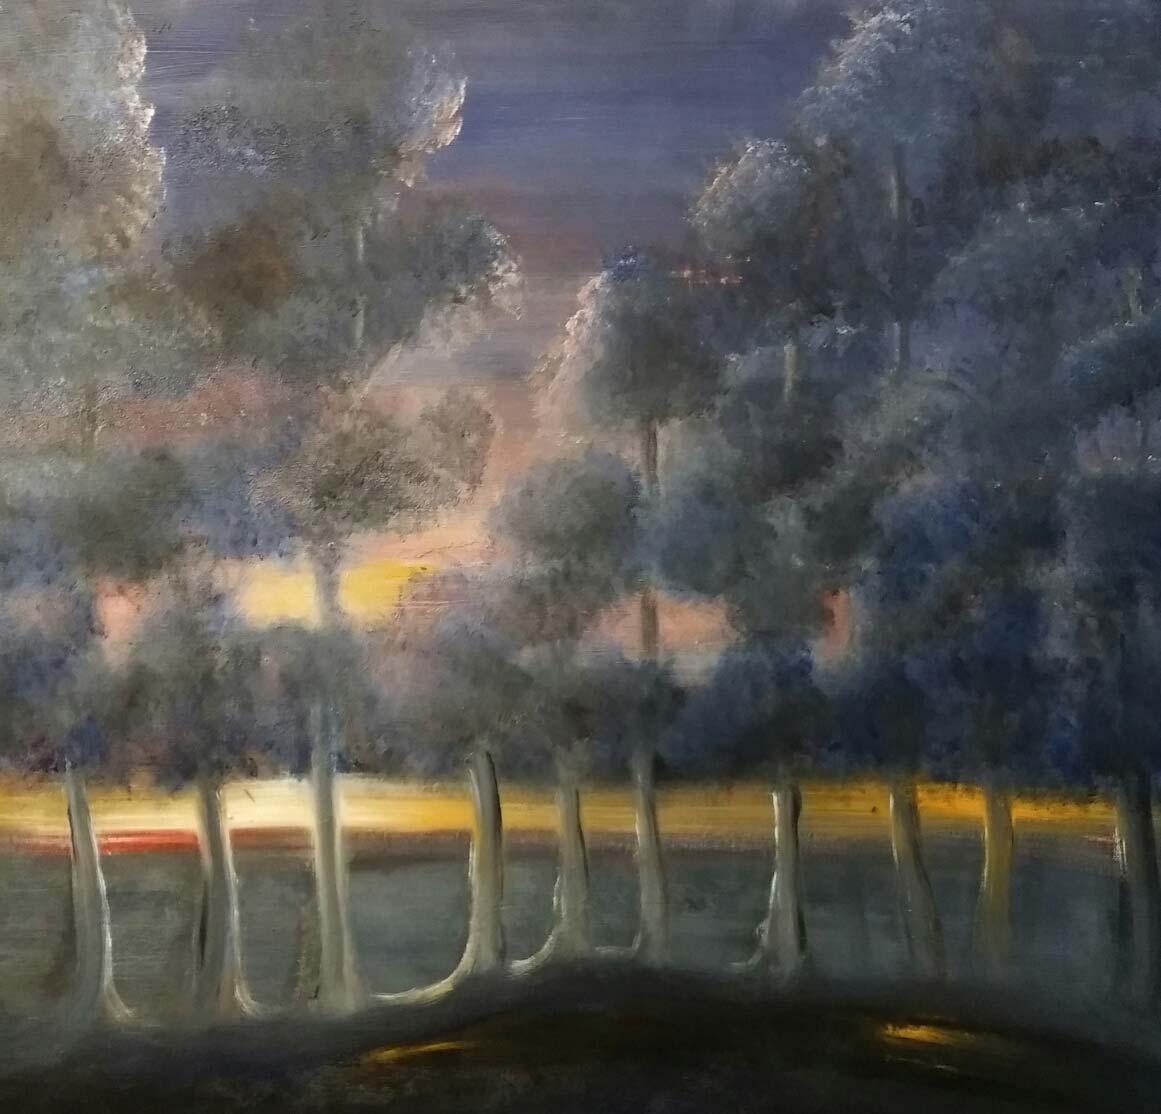 Kveldslys ved Mertajärvi - Heidi Frich Andersen